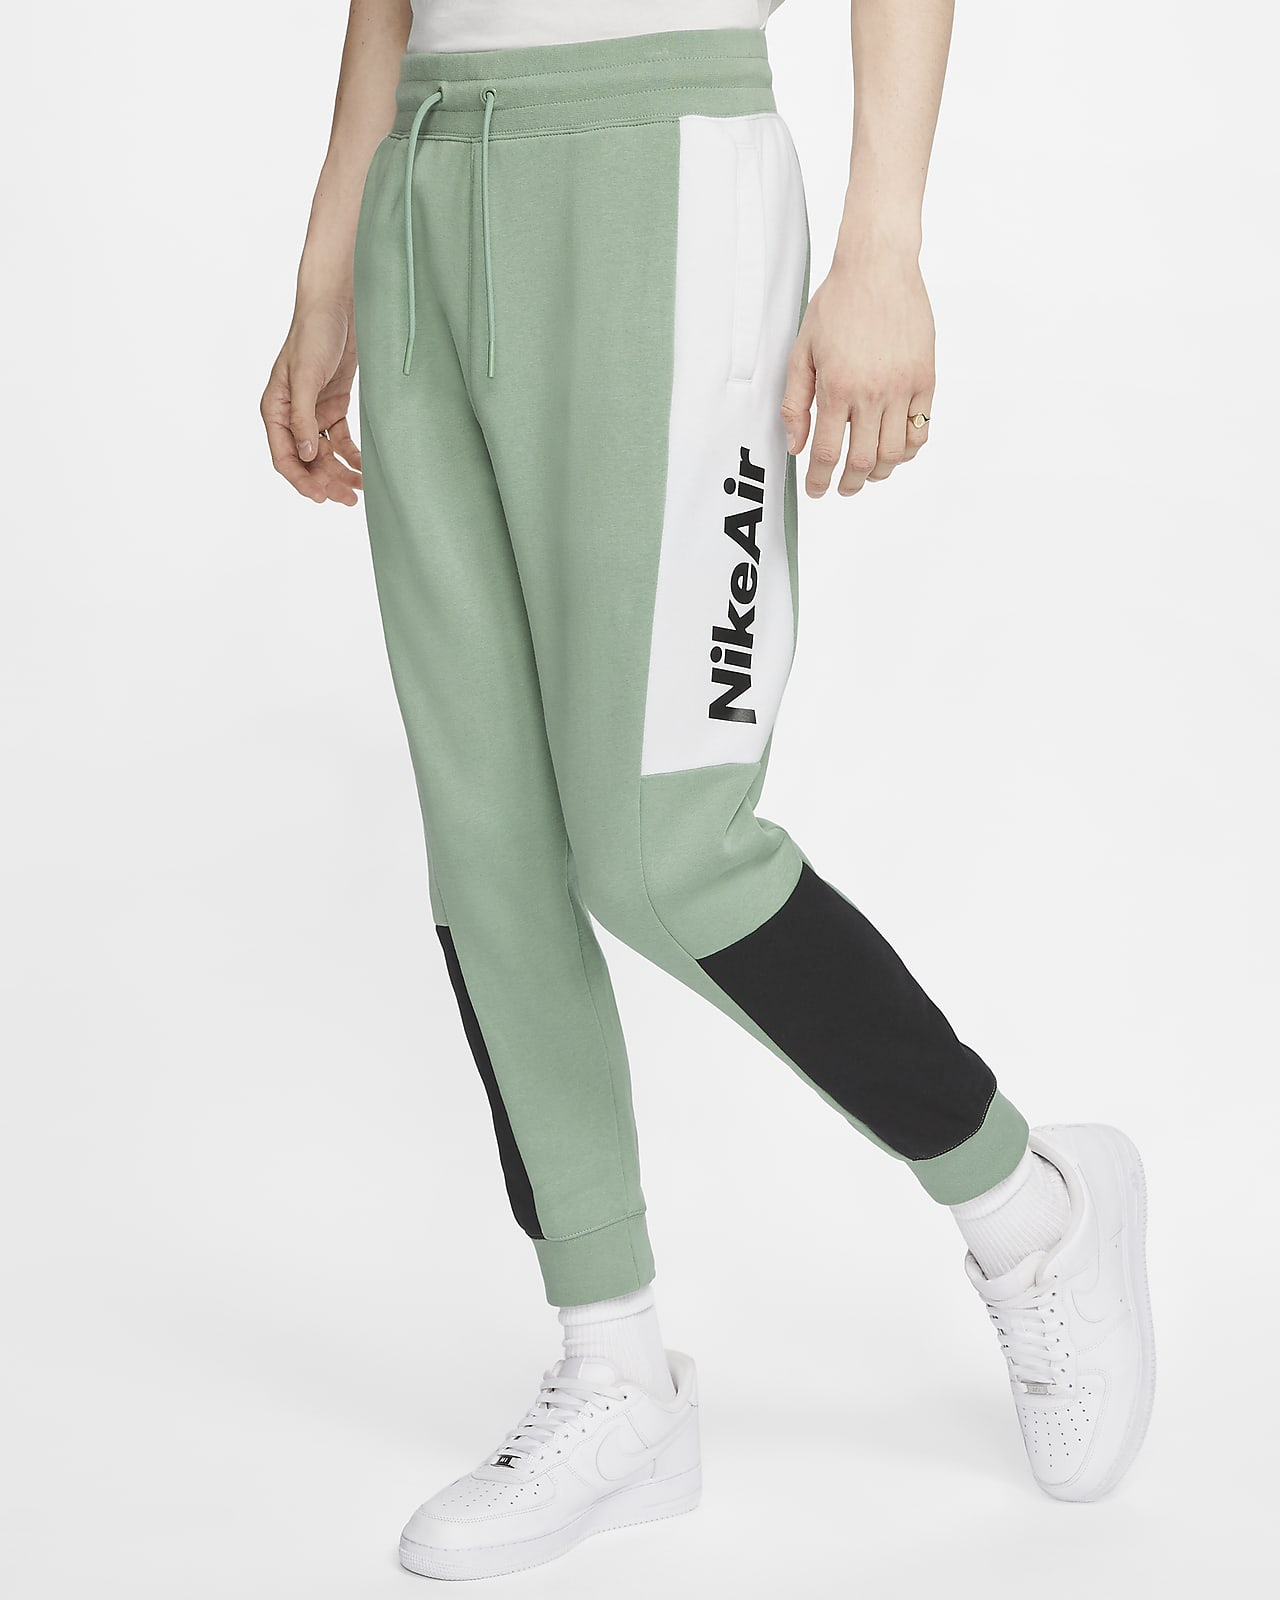 Nike Air Men's Fleece Trousers. Nike FI